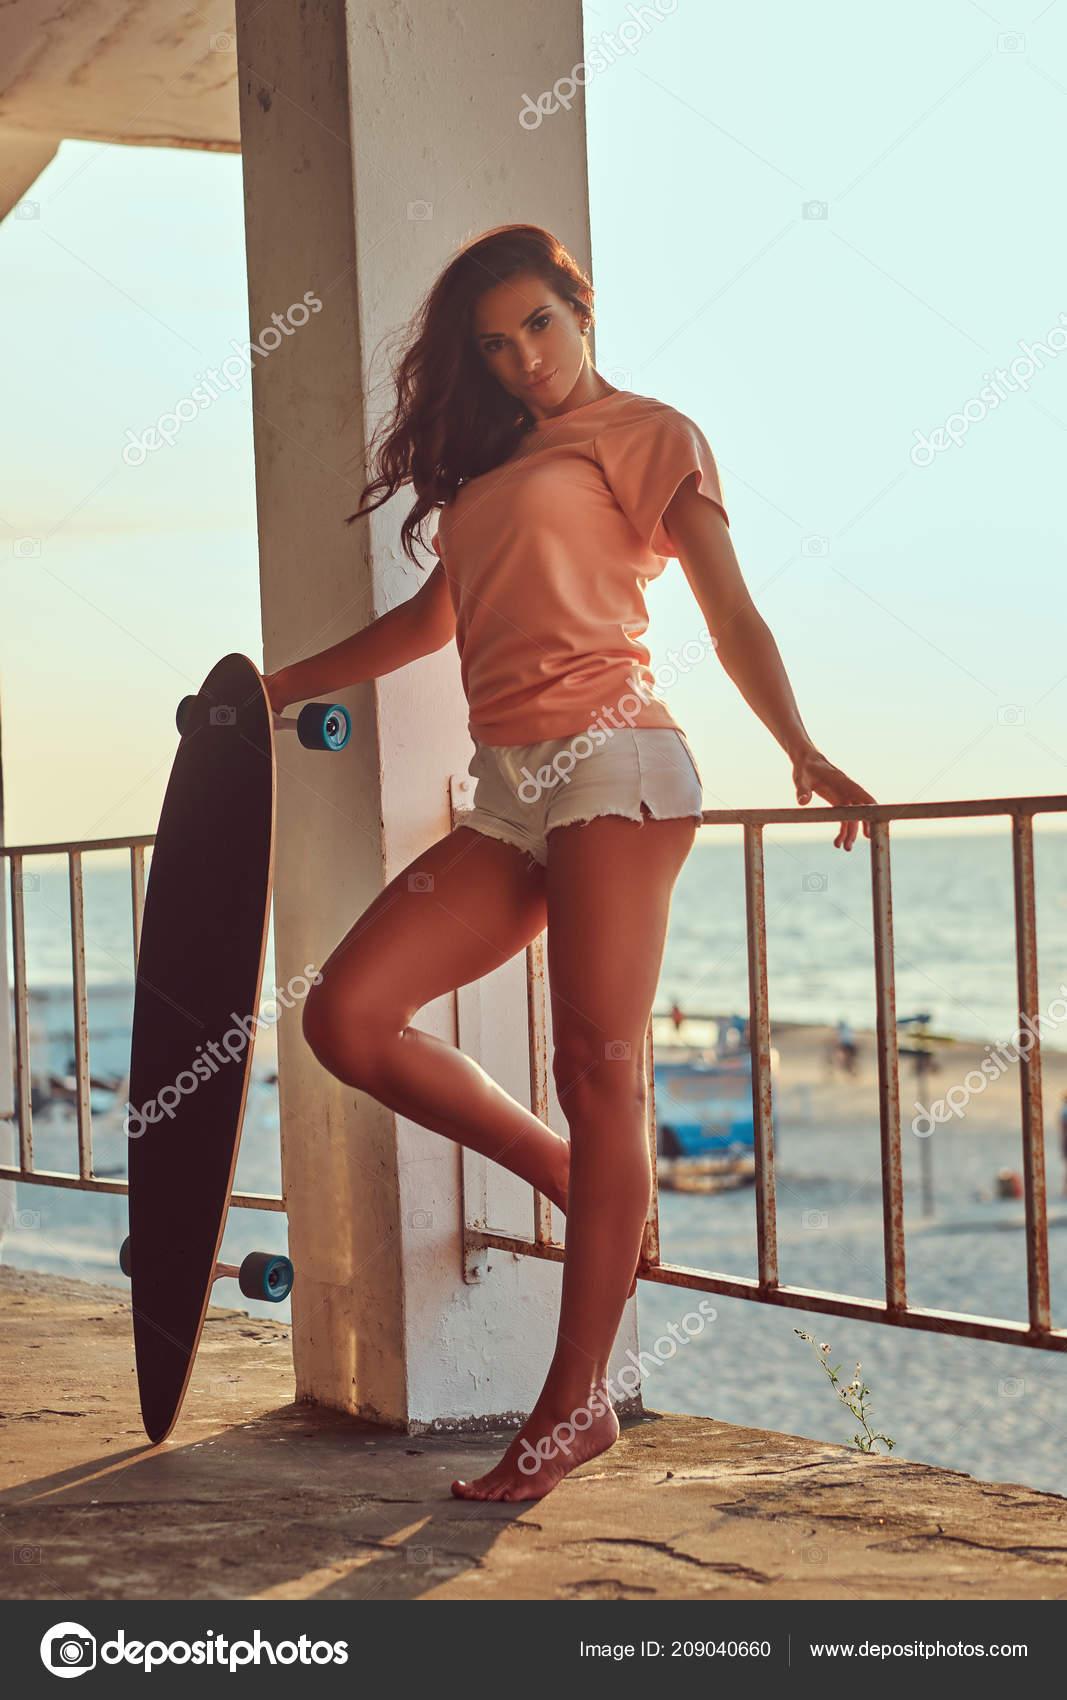 https://st4.depositphotos.com/1001959/20904/i/1600/depositphotos_209040660-stock-photo-seductive-brunette-woman-dressed-shirt.jpg